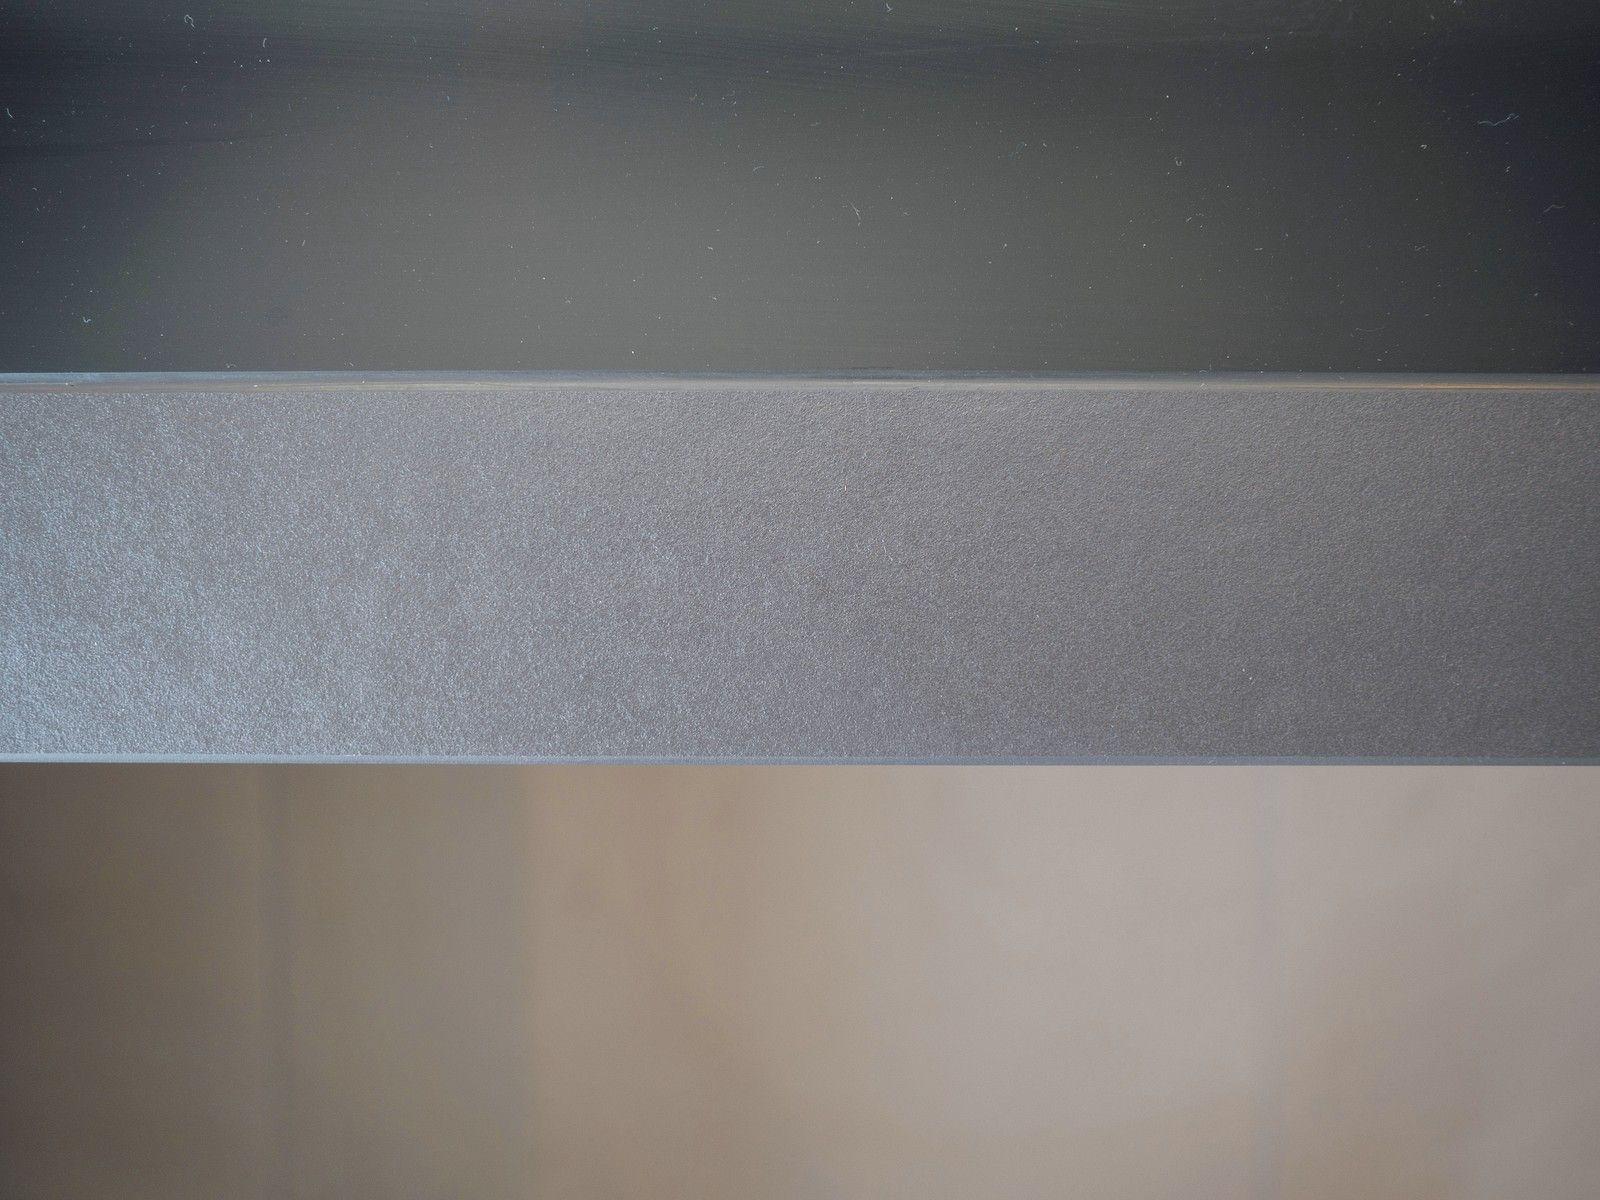 Kueche Exklusiv Design Fronten Holz Furnier Sonnenverbrannt Stahl Keramik Arbeitsplatte Miele 53 Keramik Arbeitsplatte Arbeitsplatte Kuchen Design